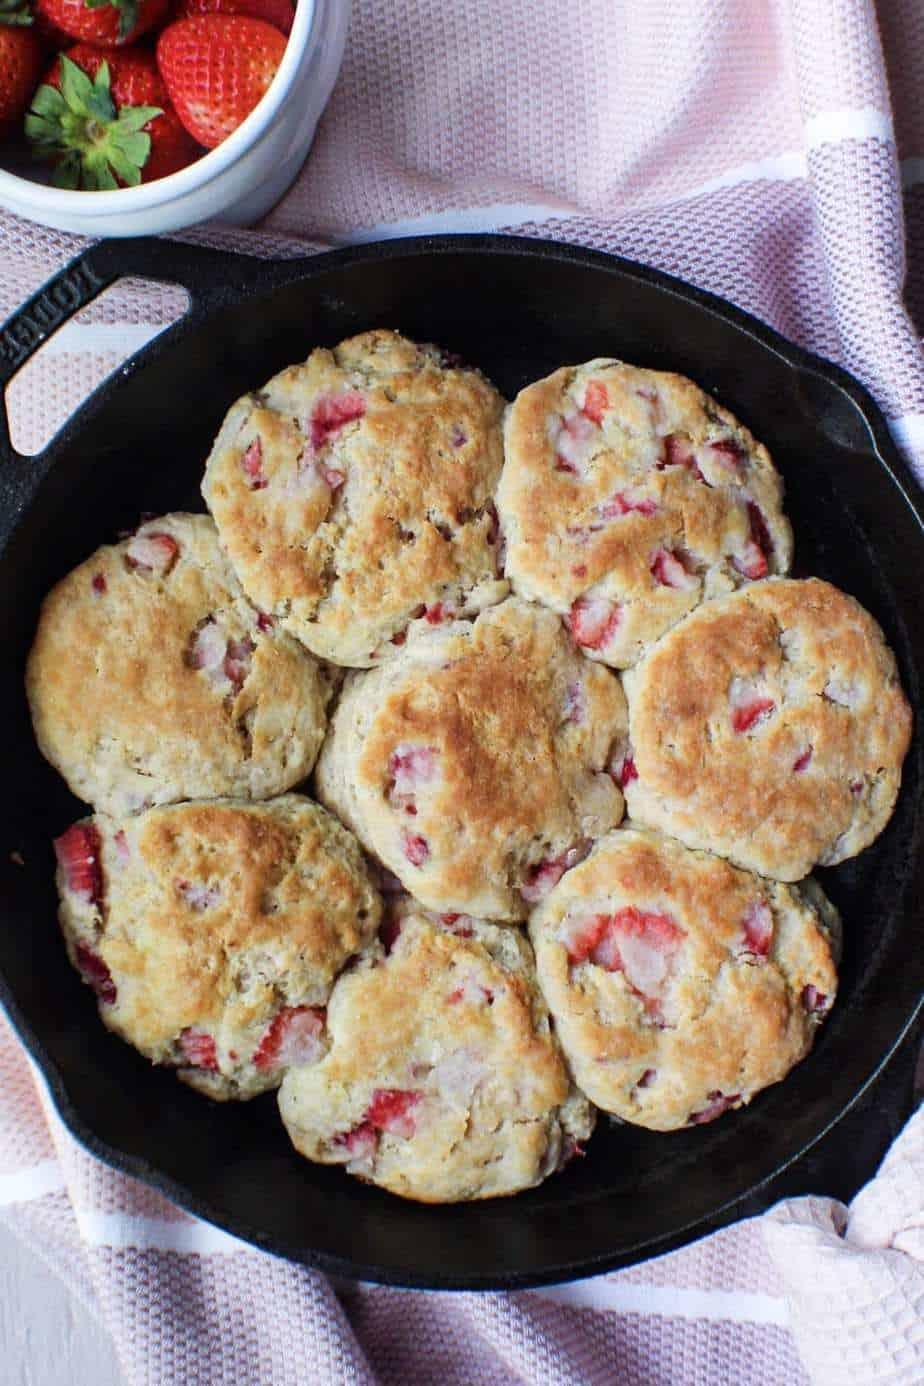 strawberry buttermilk biscuits in cast iron skillet